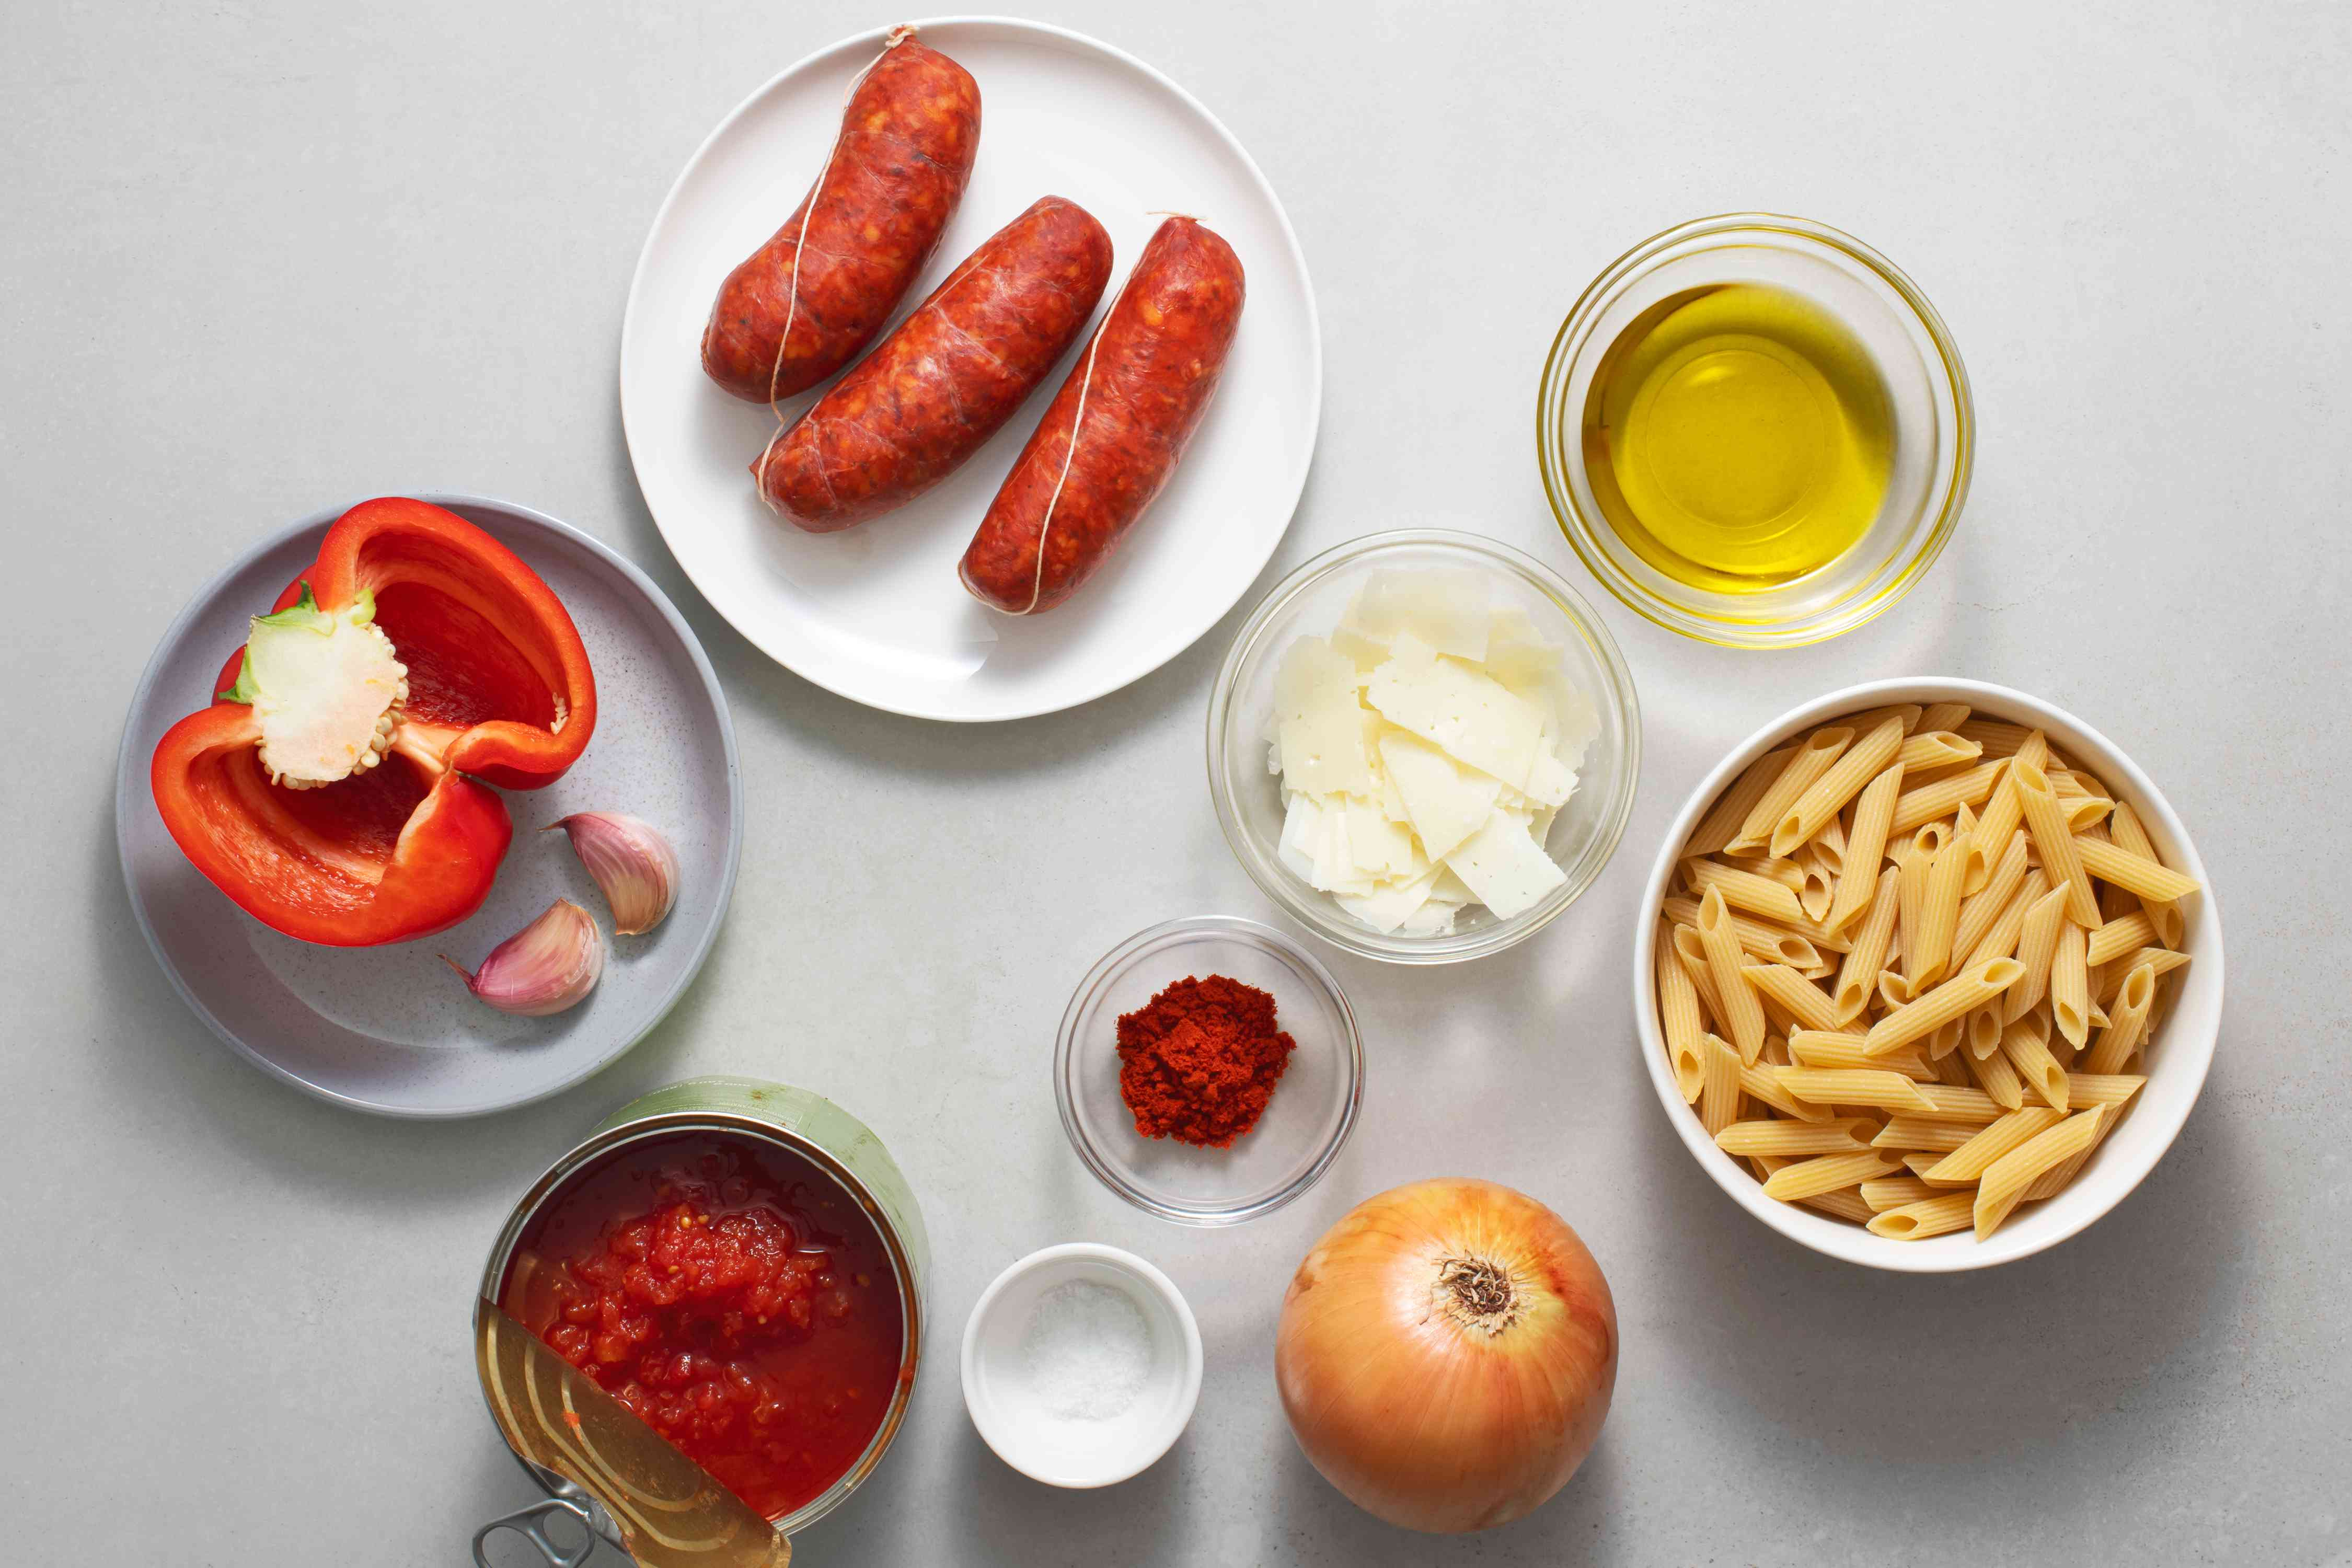 Spanish Pasta With Chorizo and Tomatoes ingredients